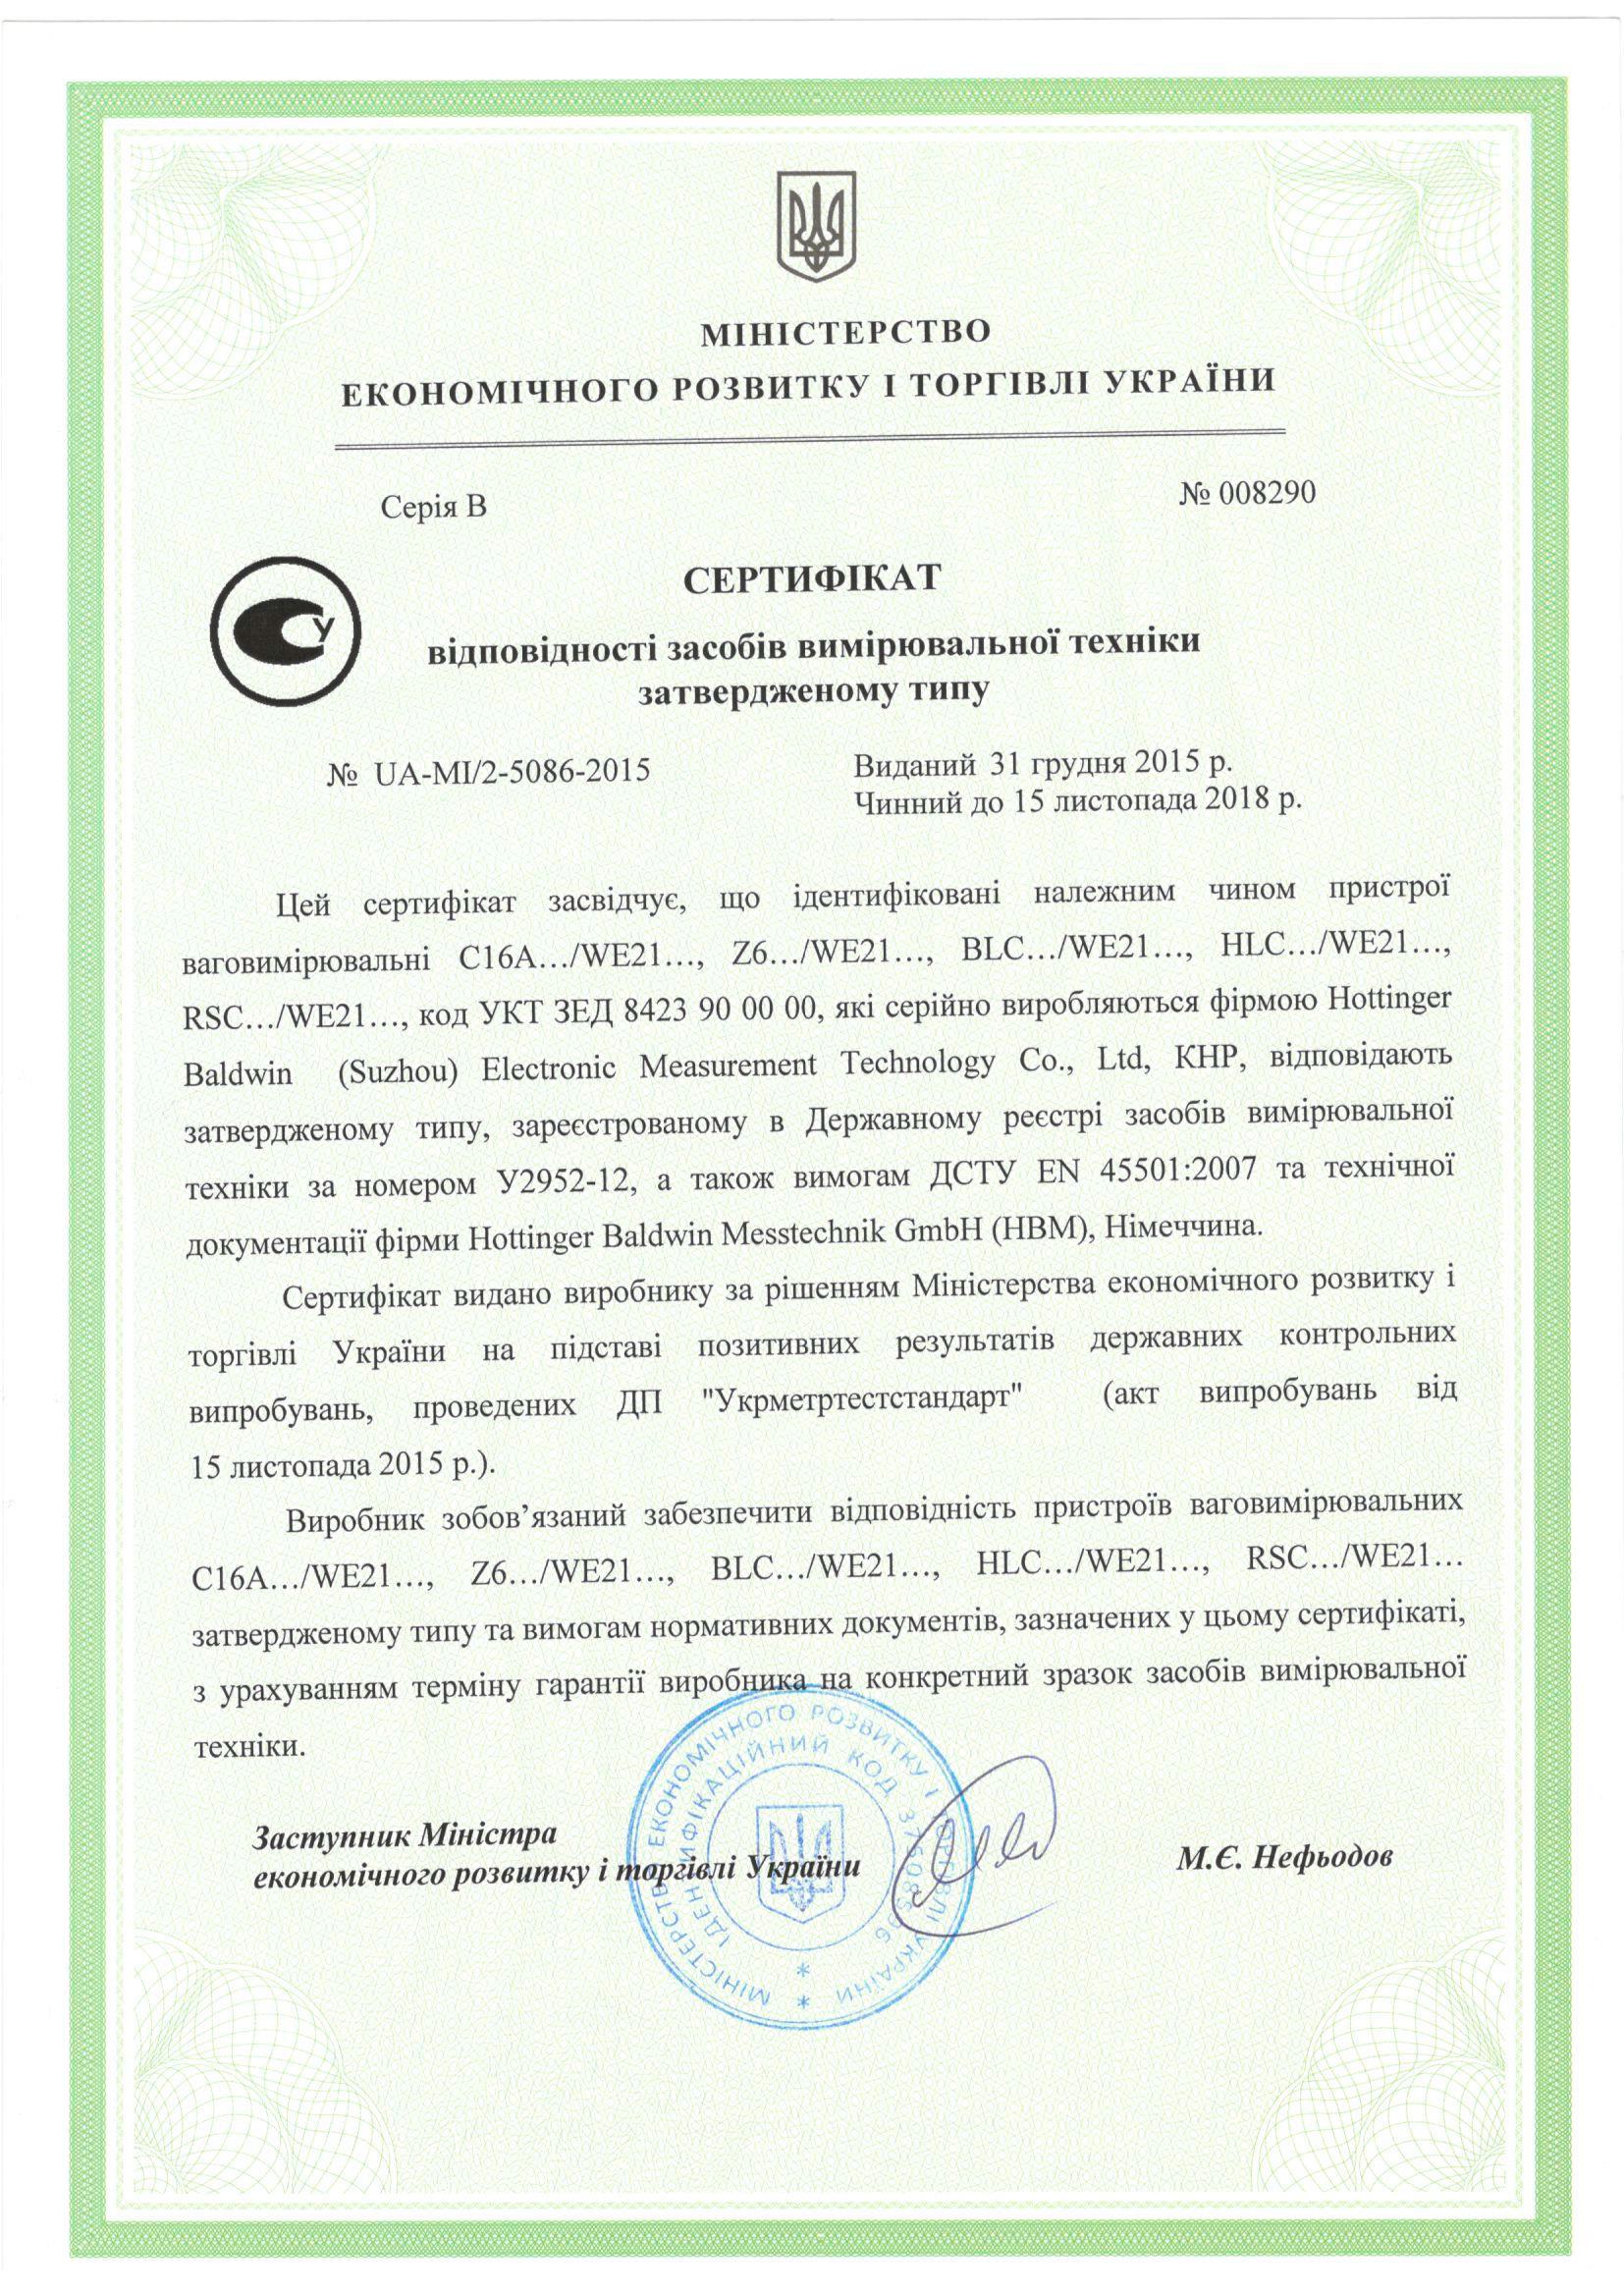 Сертифікат WE21... С16А,Z6,BLC,HLC,RSC_КНР